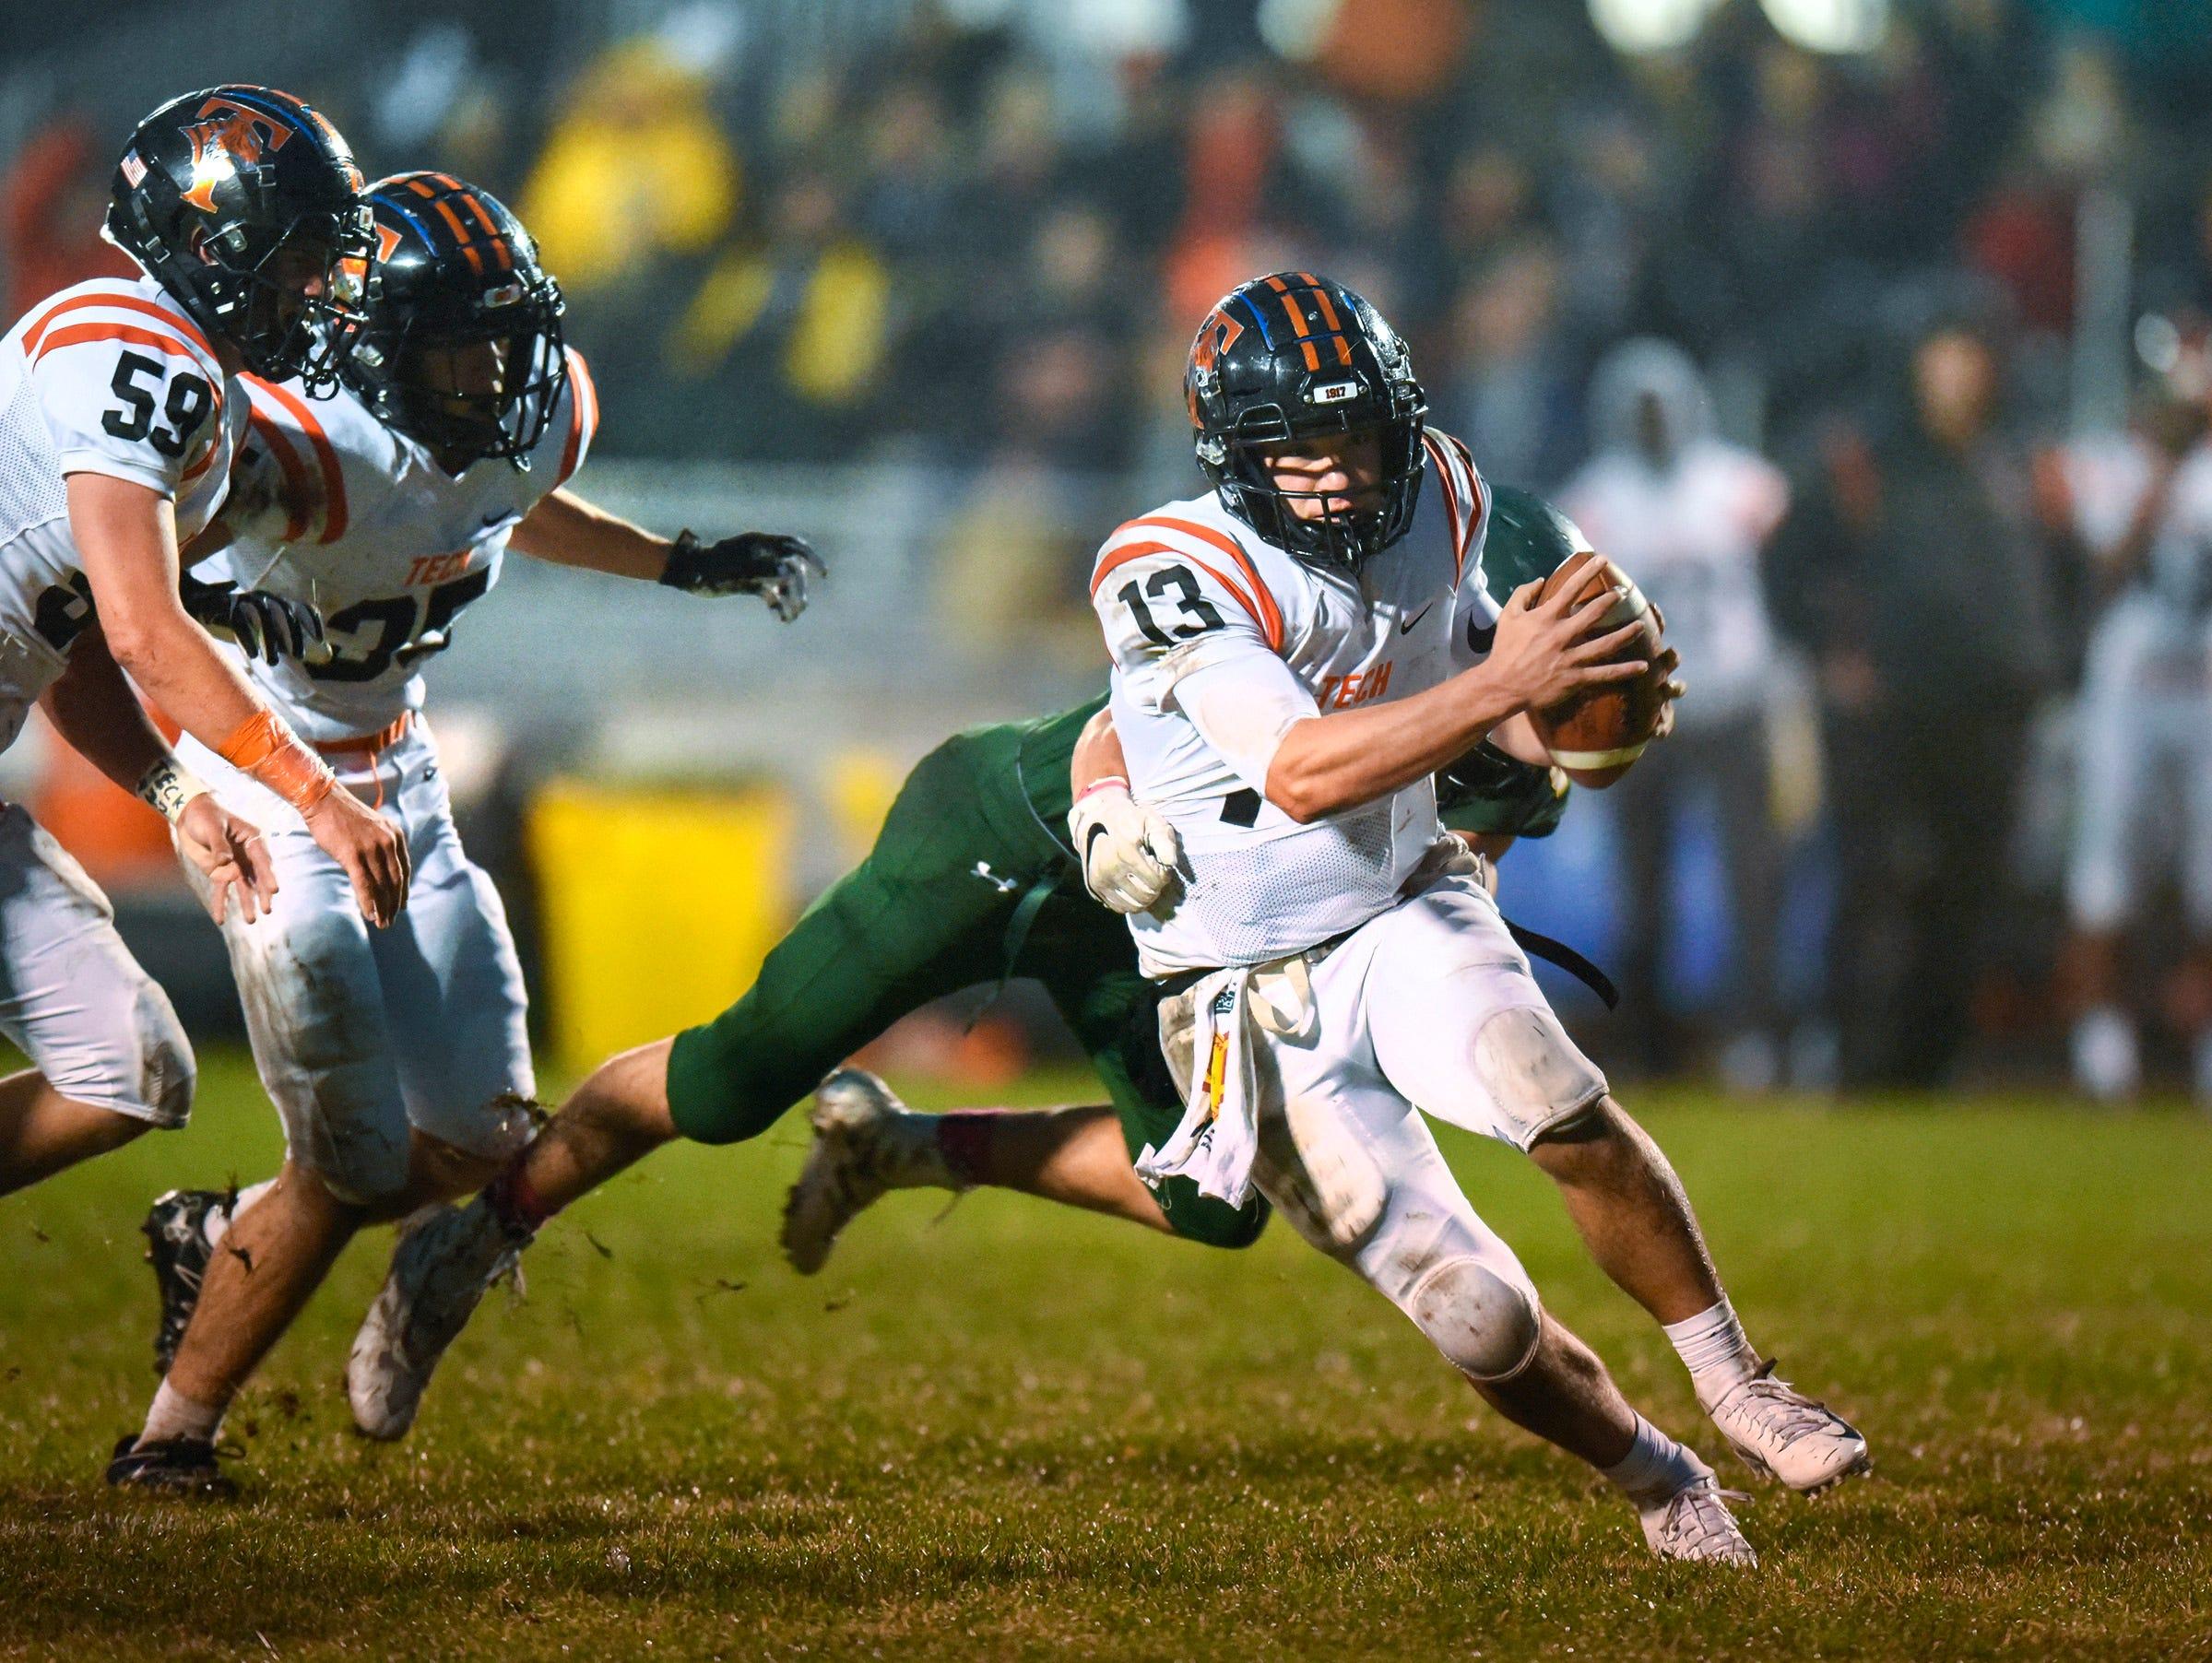 Tech quarterback Nate Trewick breaks free of a Sauk Rapids' tackle during the first half Friday, Oct. 5, in Sauk Rapids.